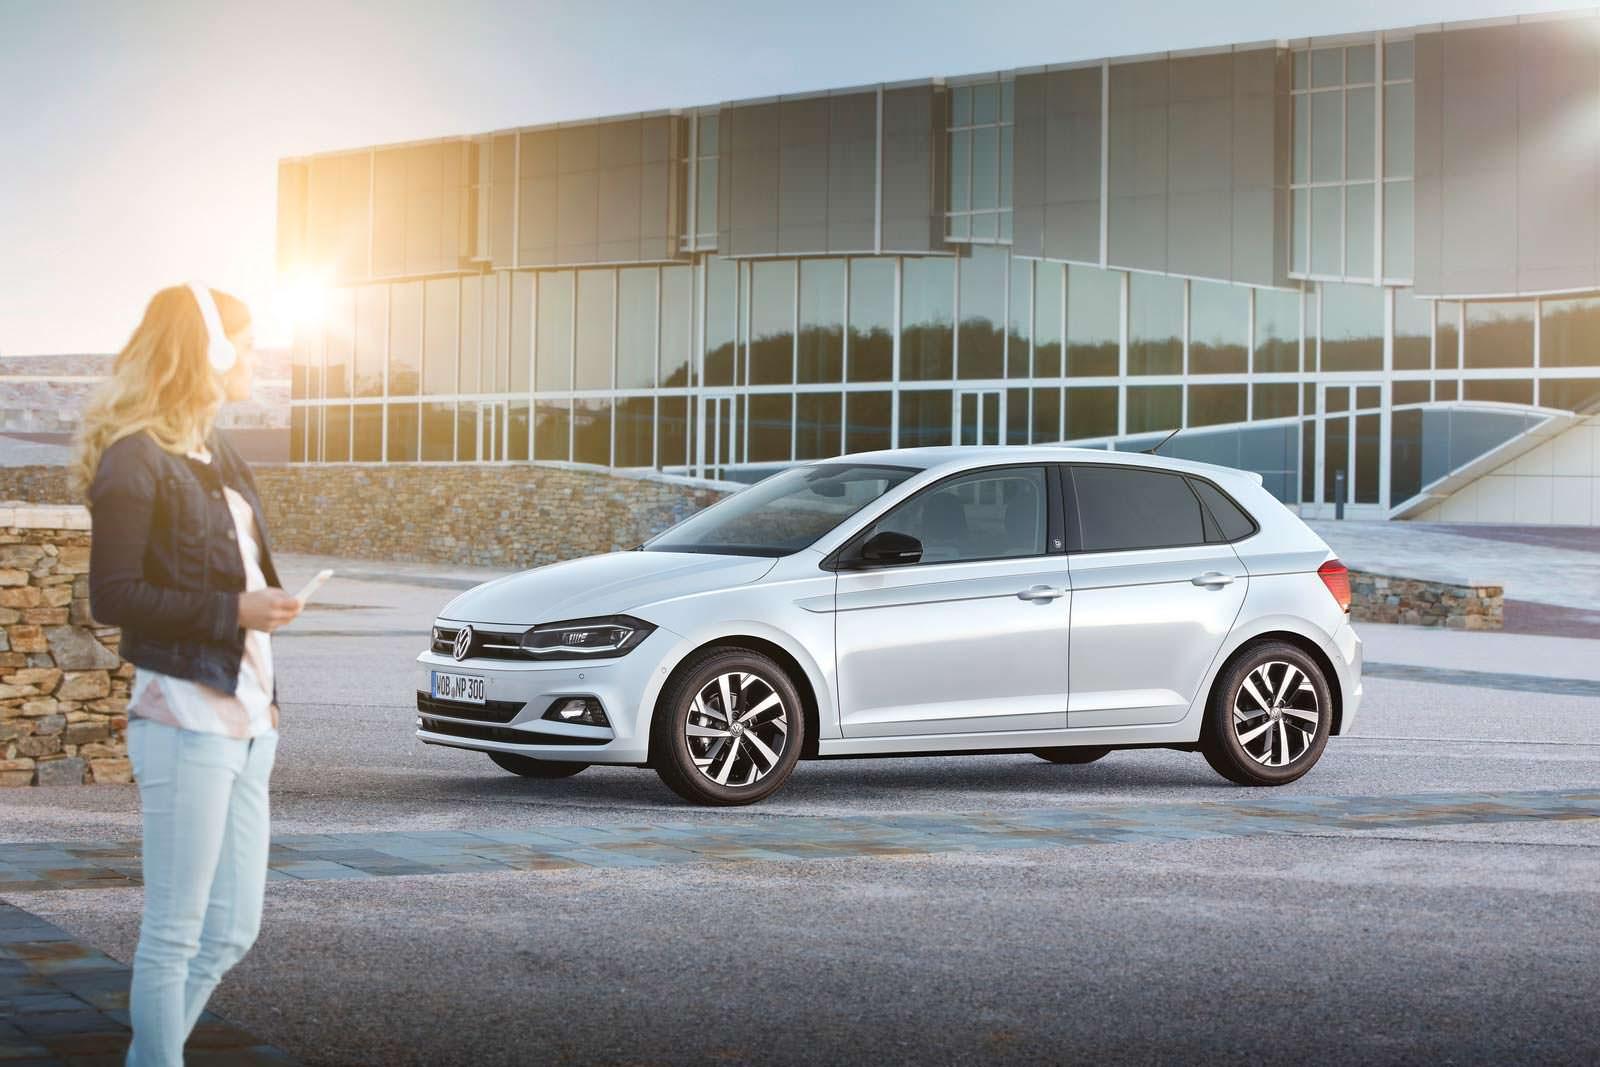 Белый Volkswagen Polo Beats. 2018 модельный год